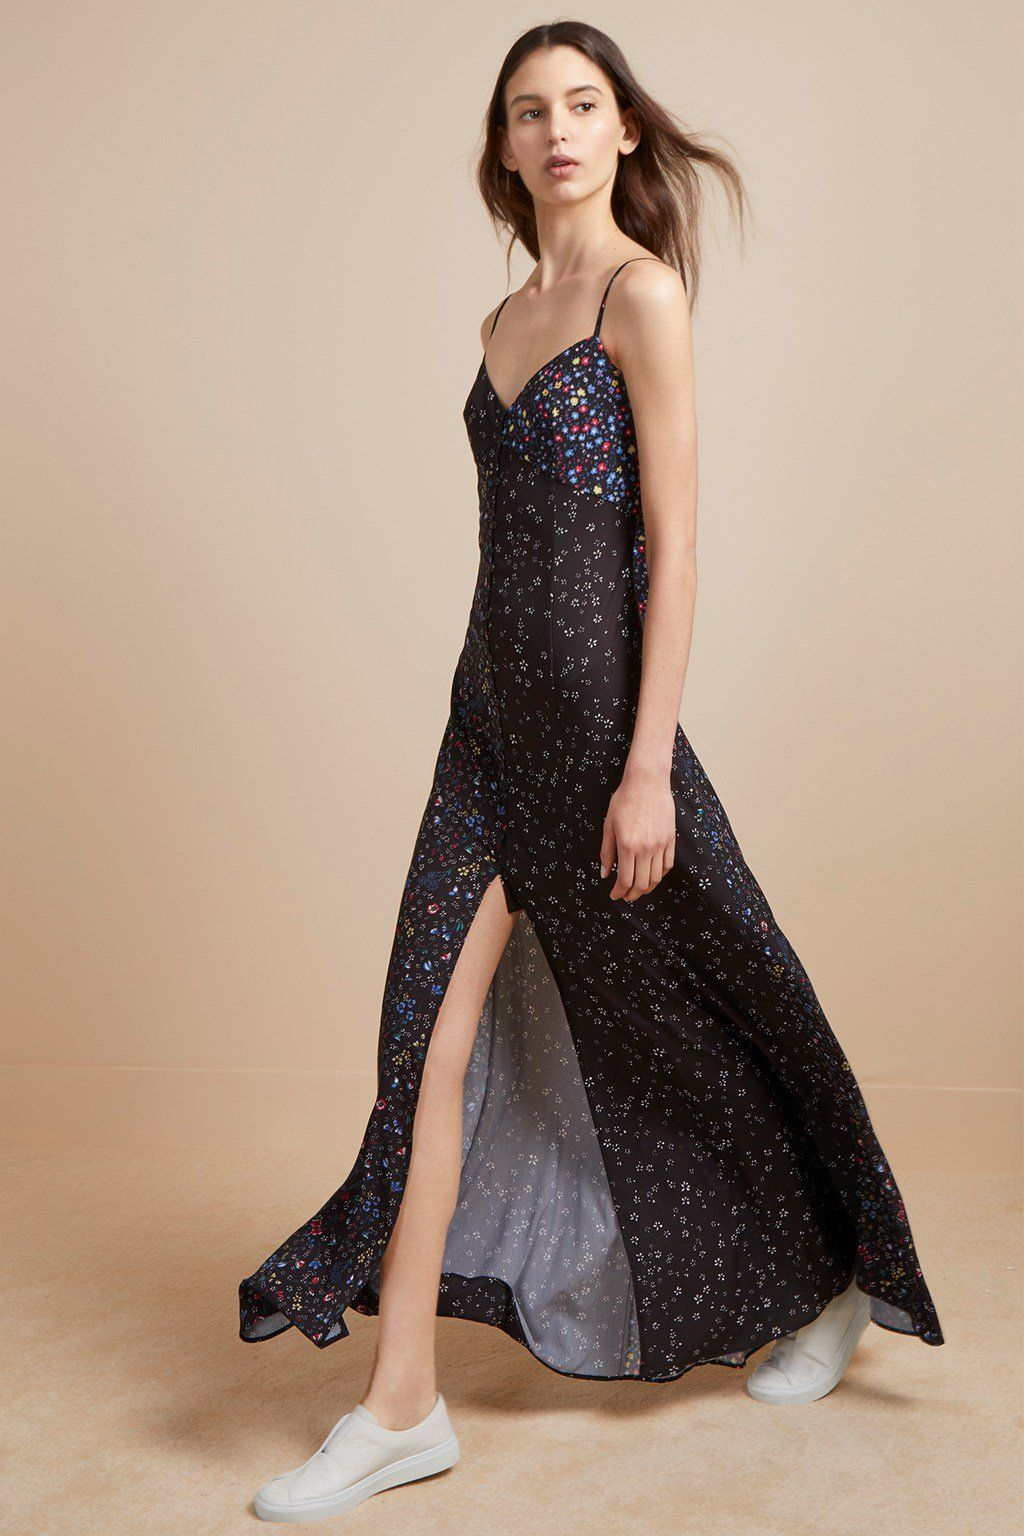 a7459a0d24 aubine fluid floral maxi dress